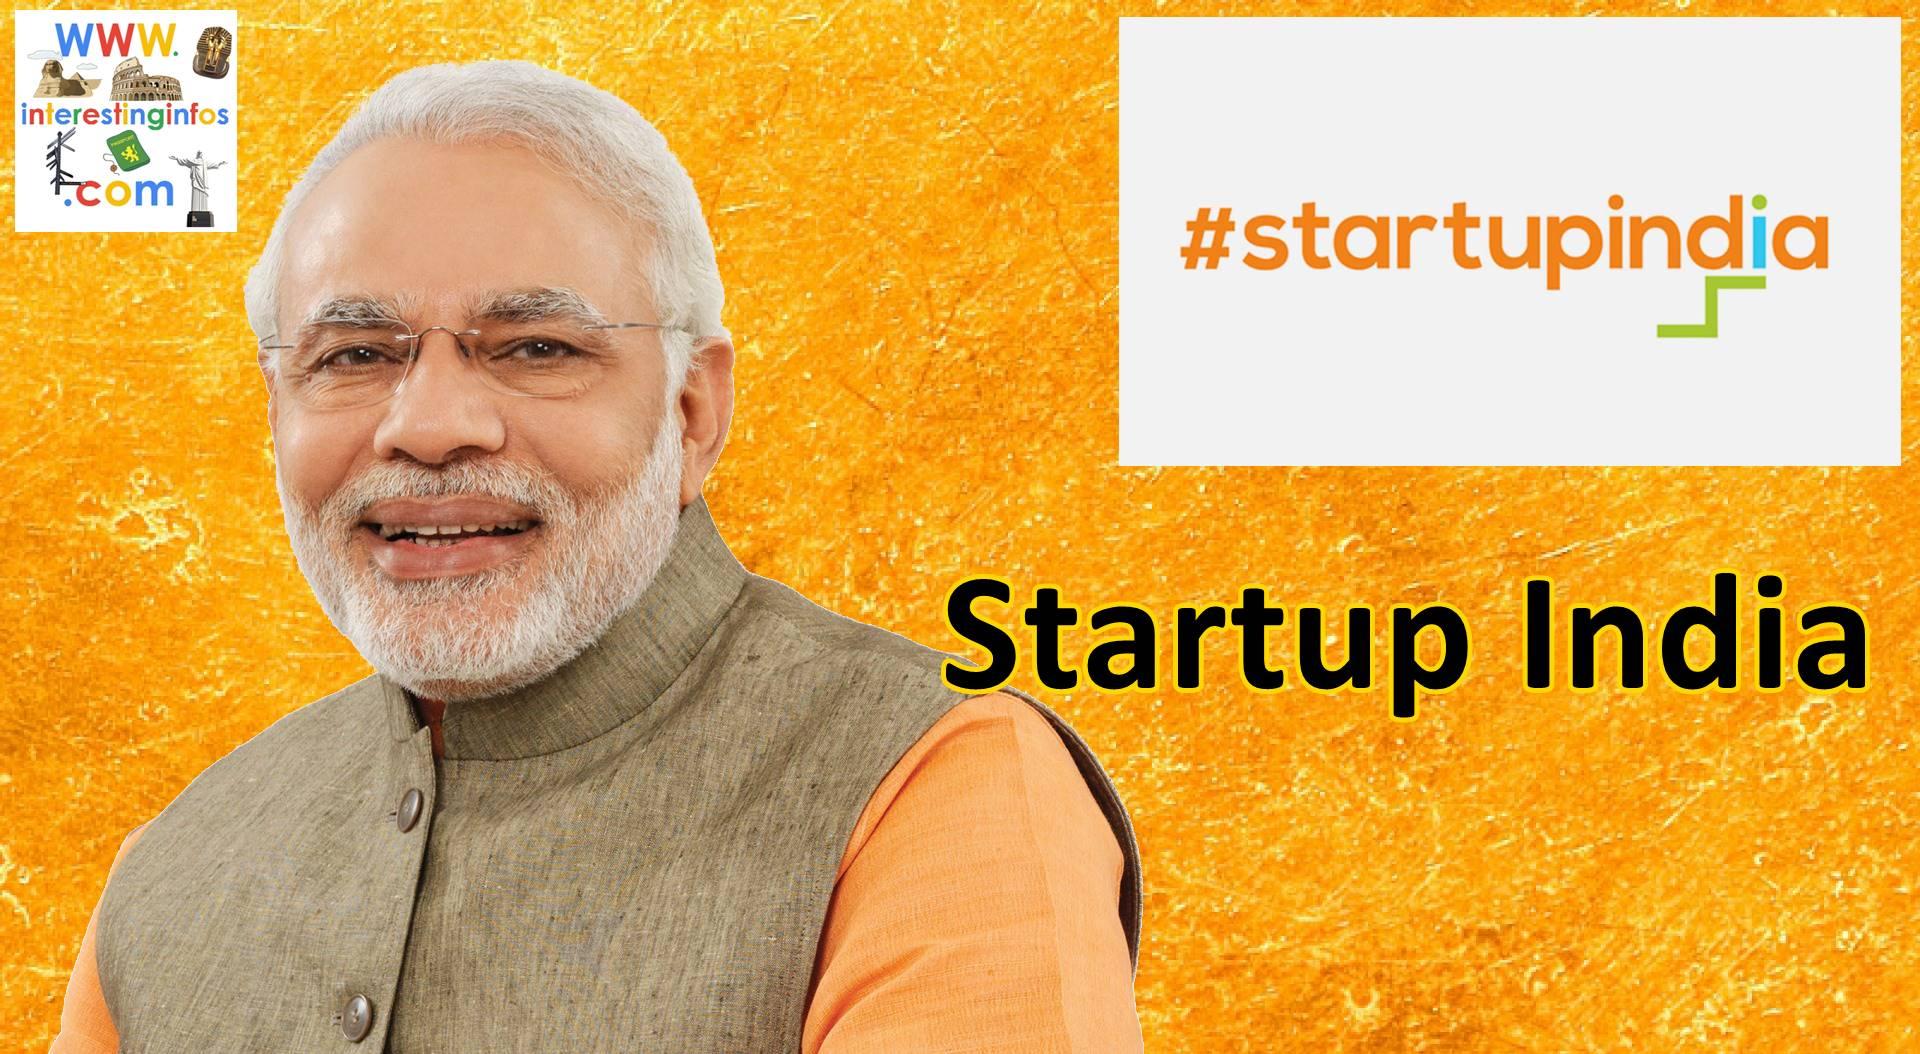 Narendra modi Startup india